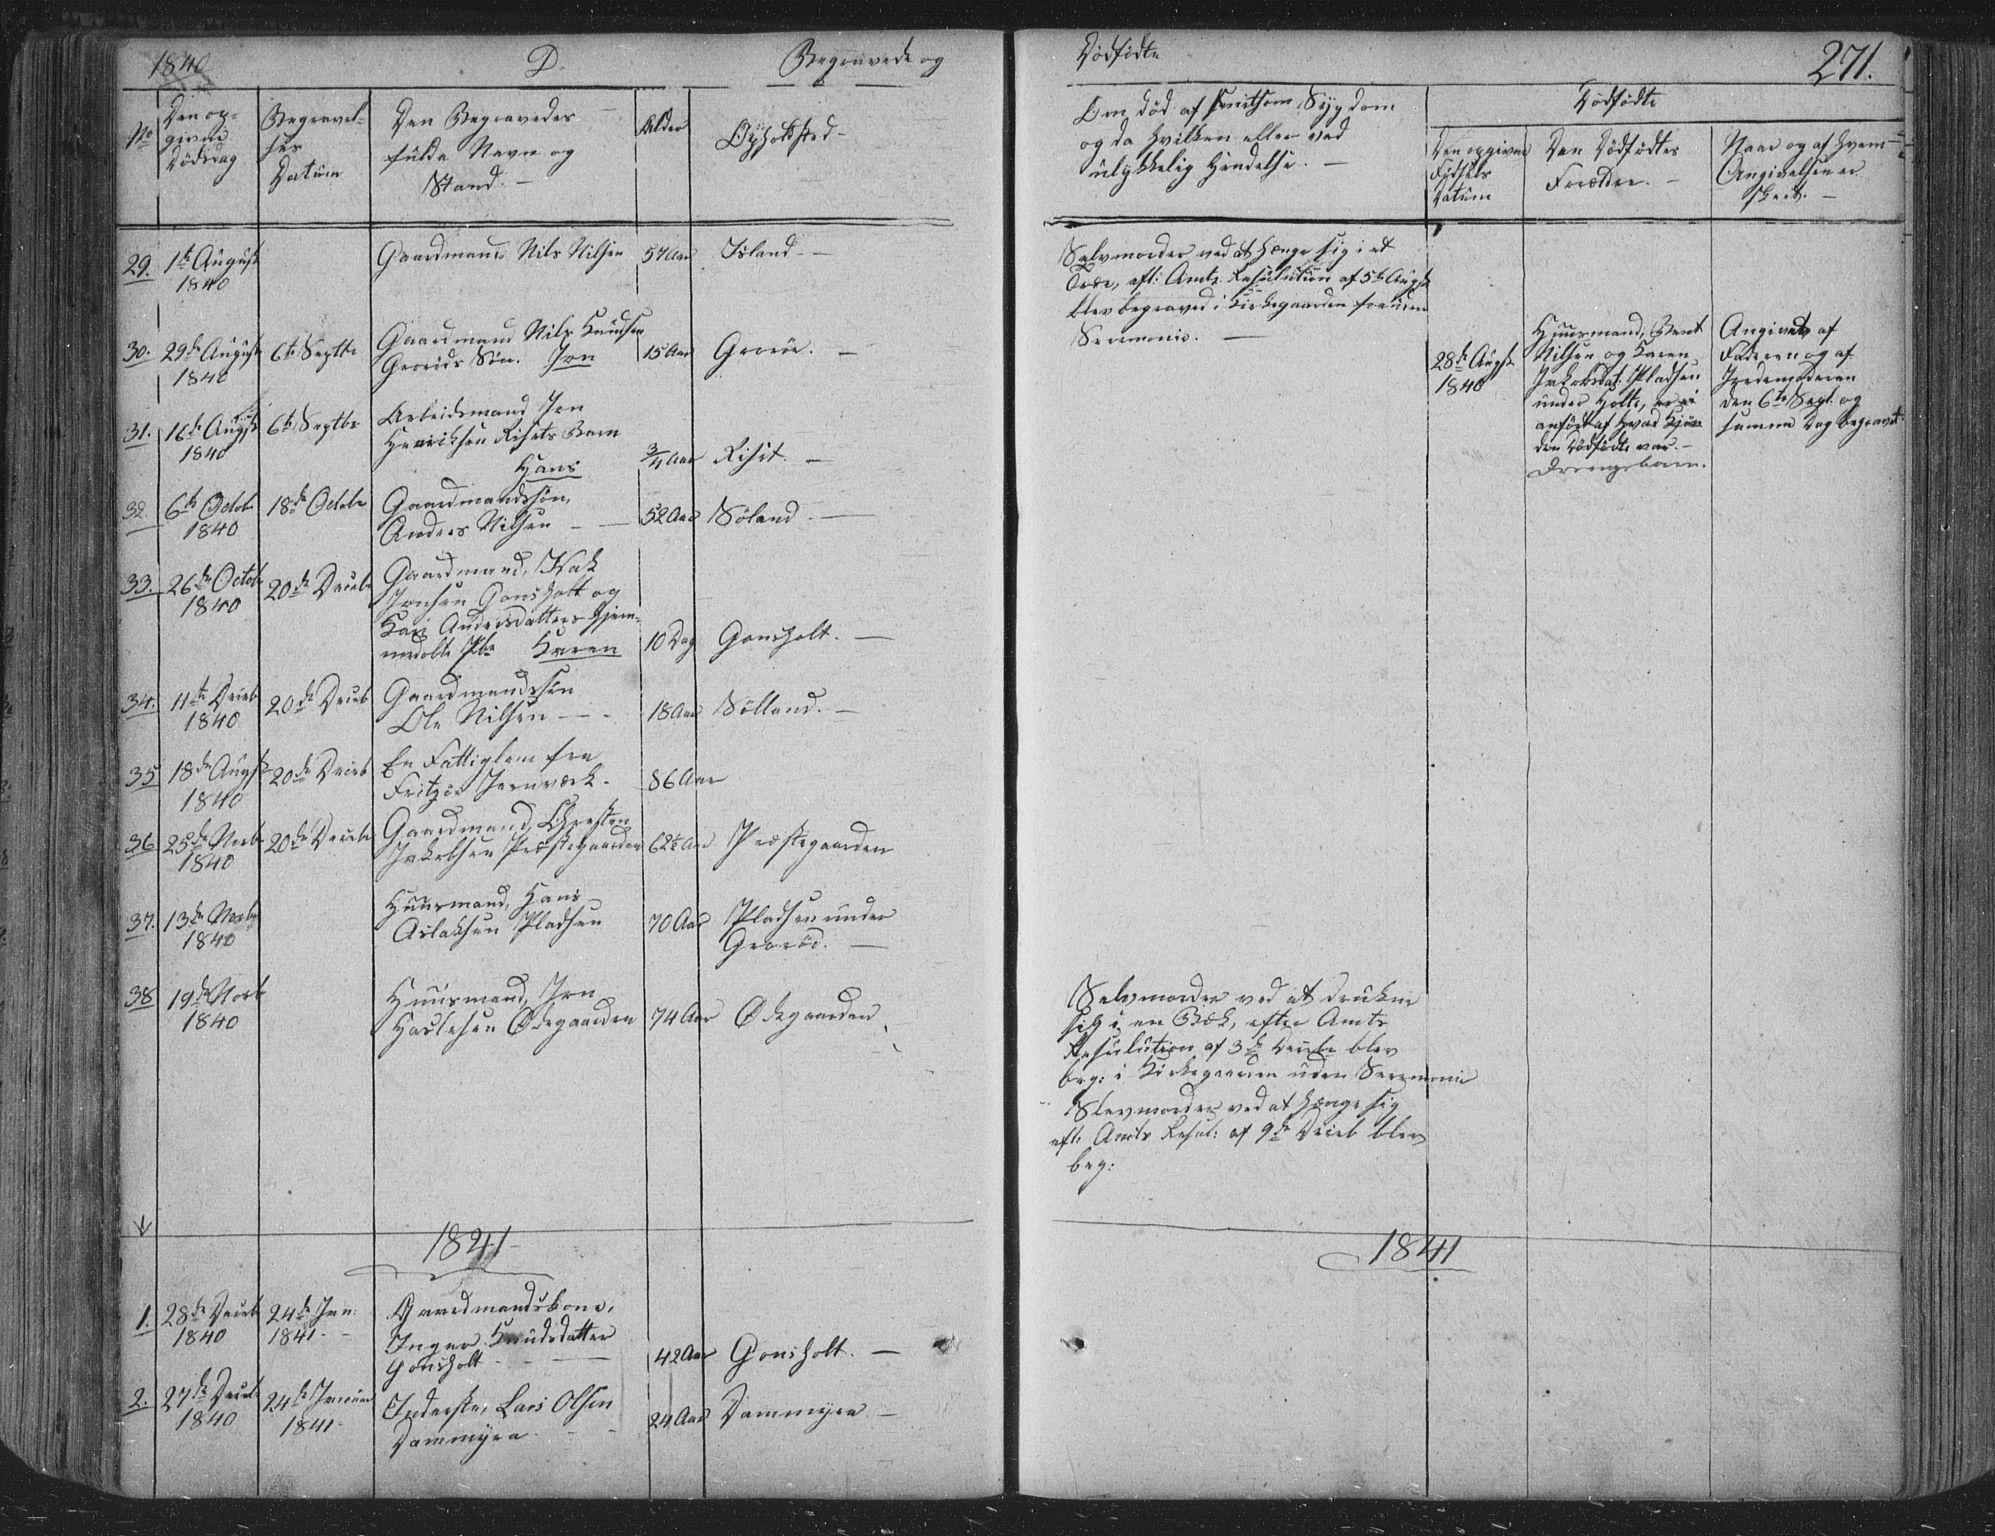 SAKO, Siljan kirkebøker, F/Fa/L0001: Parish register (official) no. 1, 1831-1870, p. 271